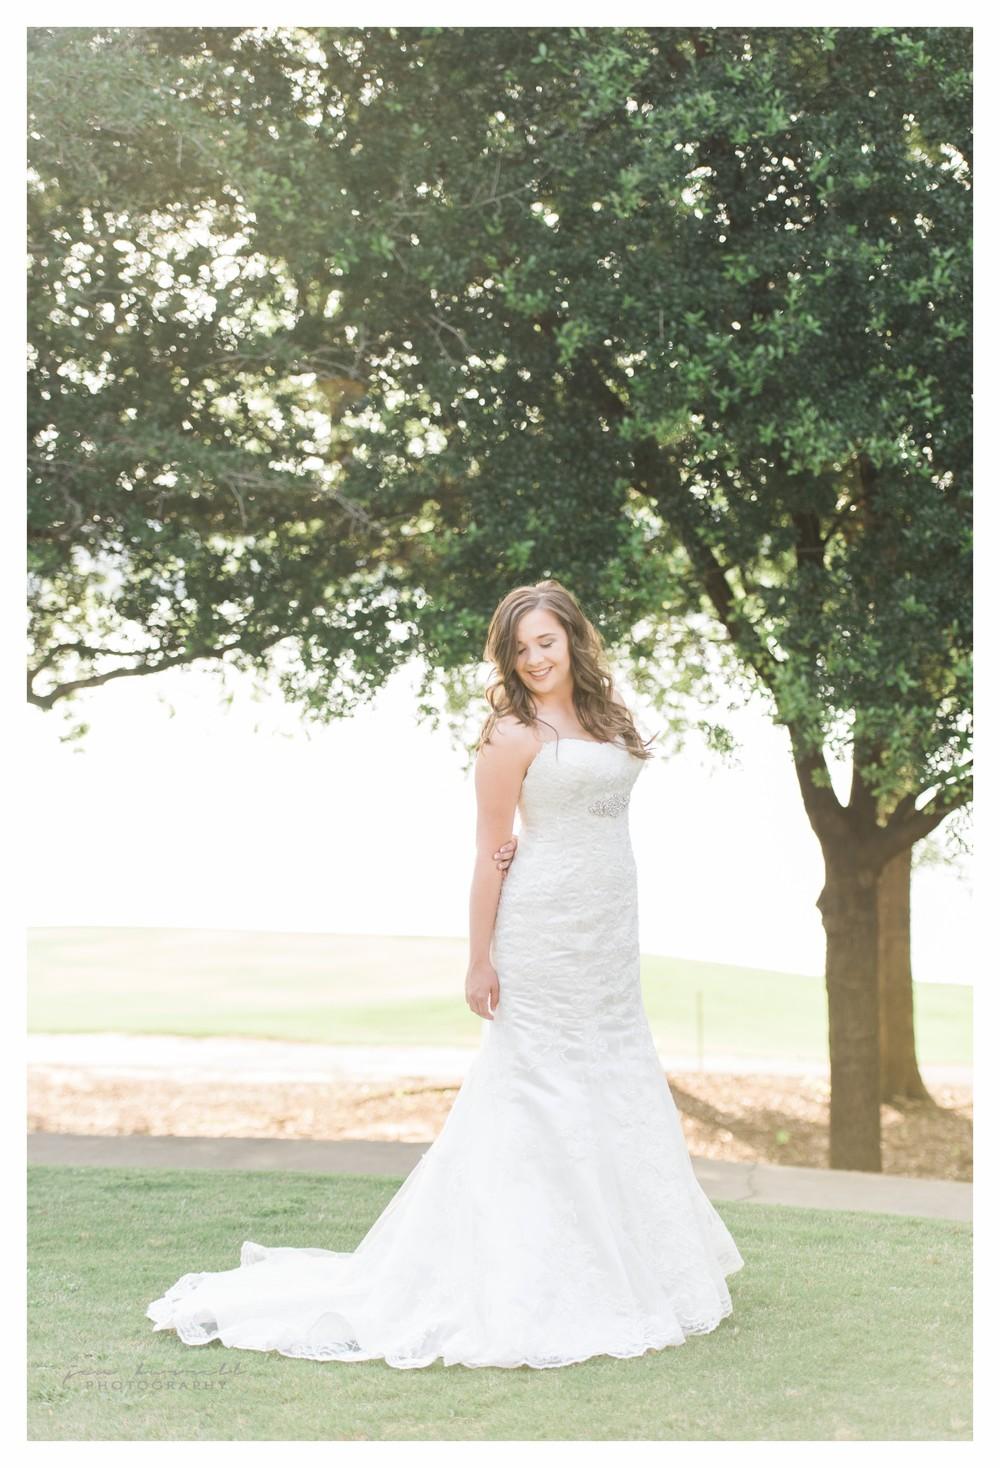 Bridal Session Blog 2.jpg